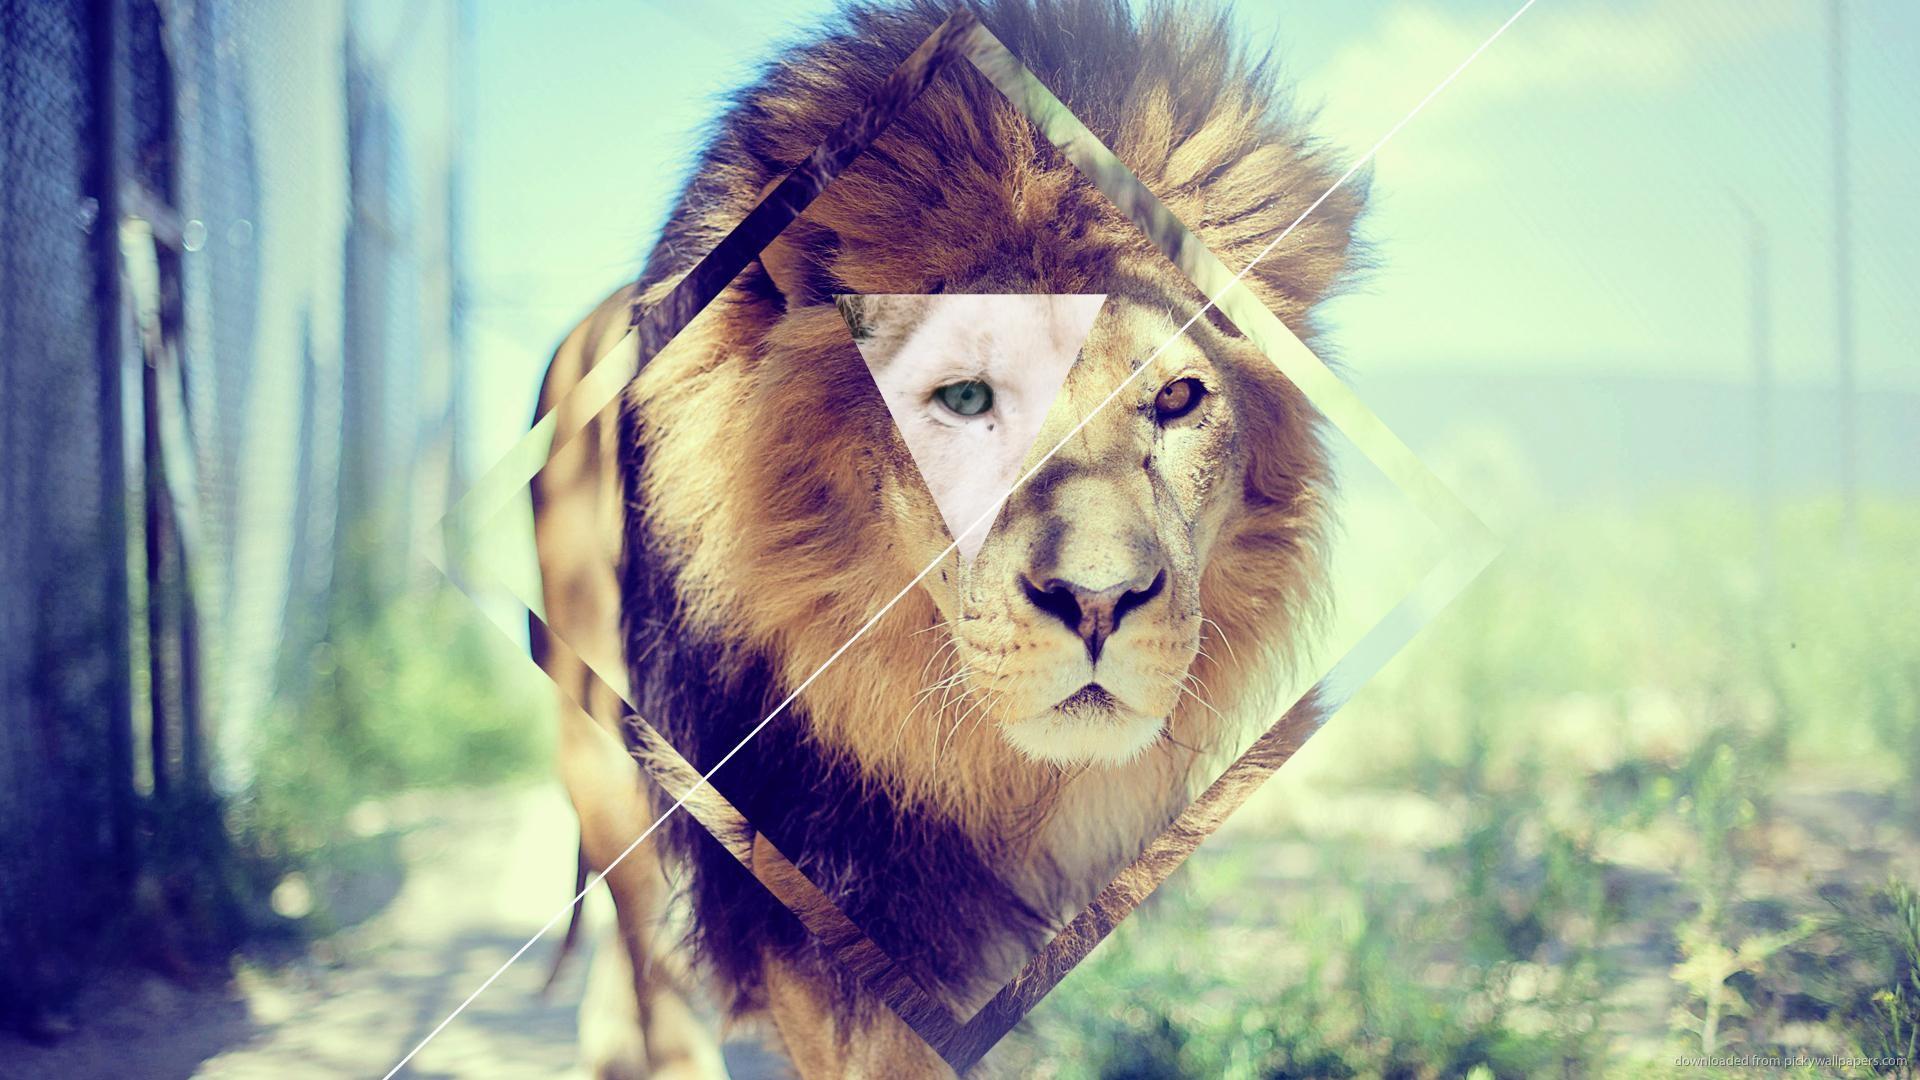 Hipster-Wallpaper-Concept-Lion